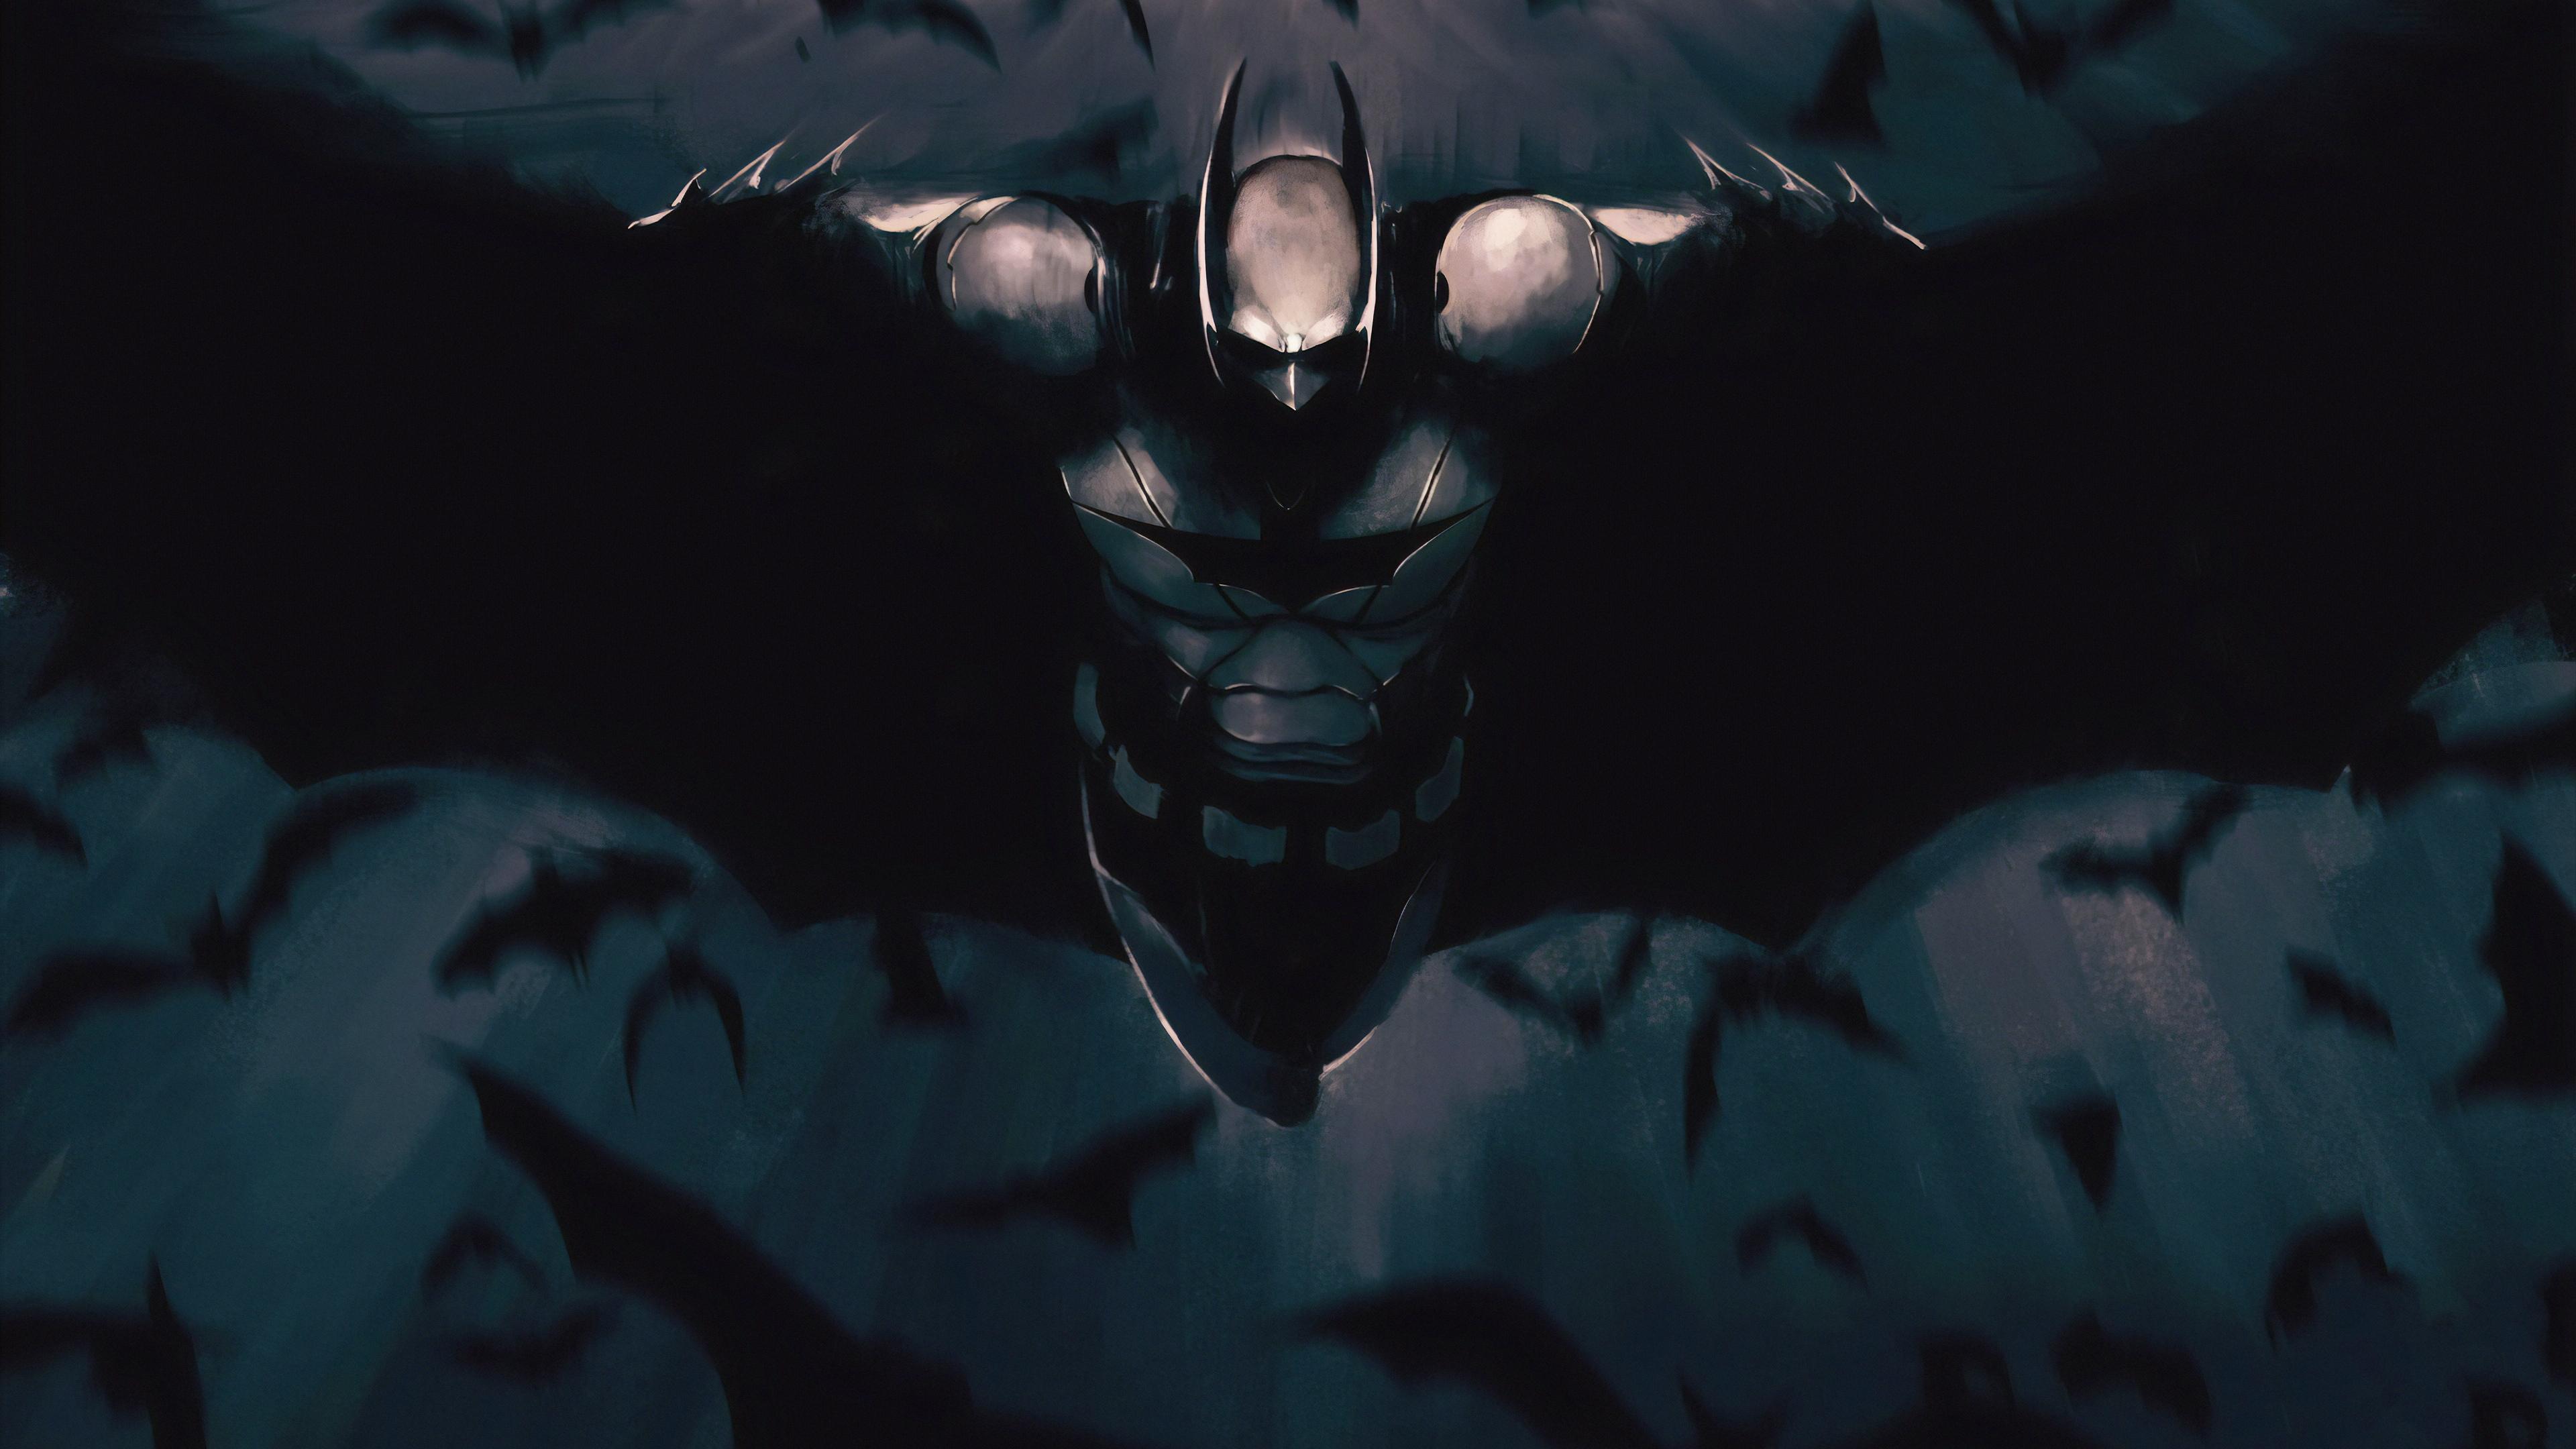 batman new flying 1565053808 - Batman New Flying - superheroes wallpapers, hd-wallpapers, digital art wallpapers, batman wallpapers, artwork wallpapers, artstation wallpapers, 4k-wallpapers